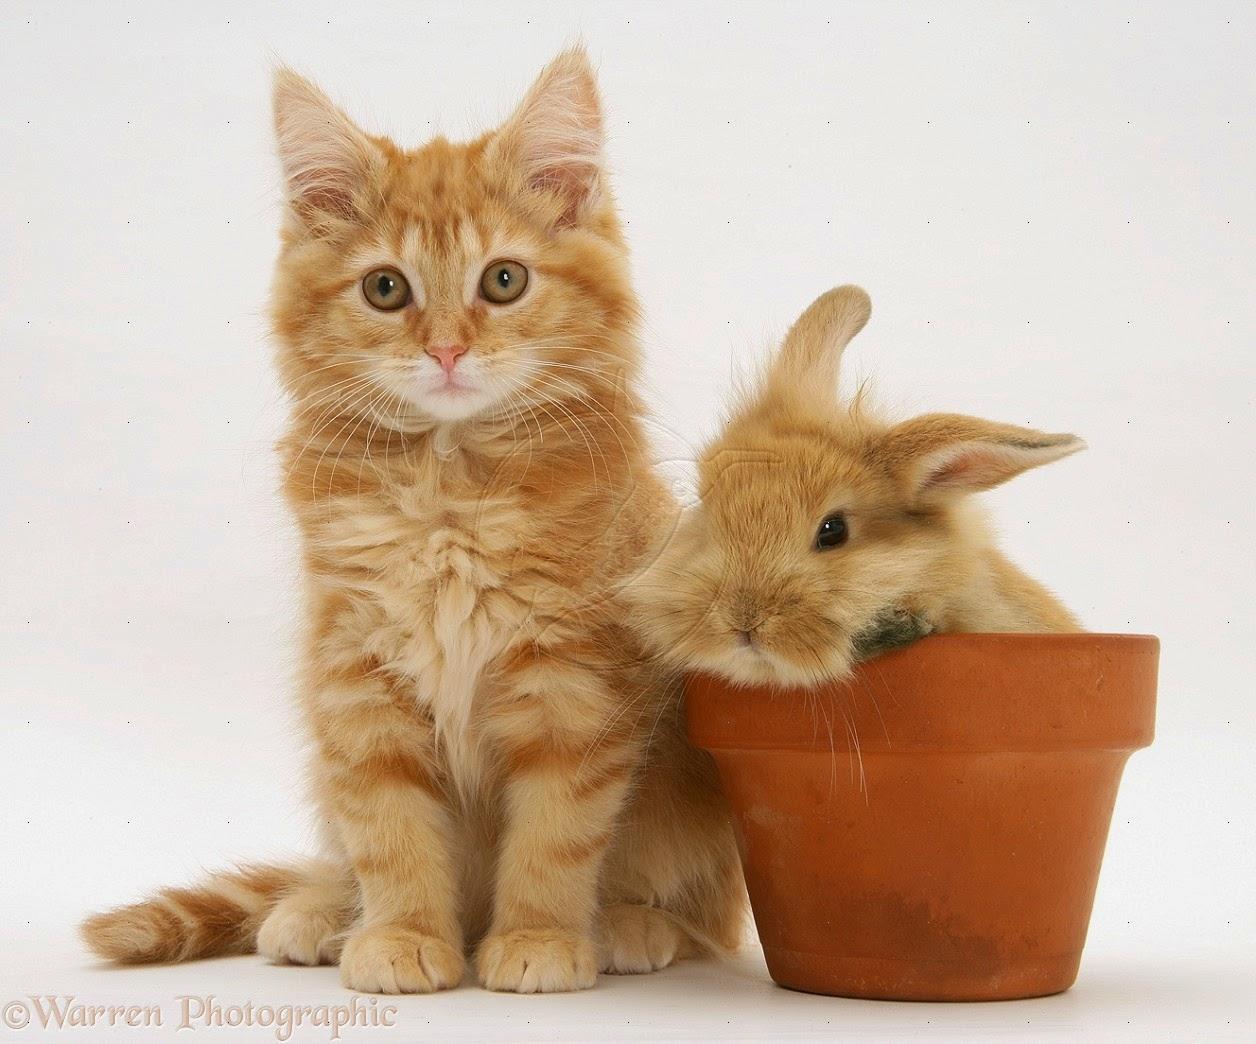 150 Gambar Kucing Lucu Dan Imut Anggora Persia Maine Kucing Anggora Lucu Dan Imut 1256x1044 Download Hd Wallpaper Wallpapertip